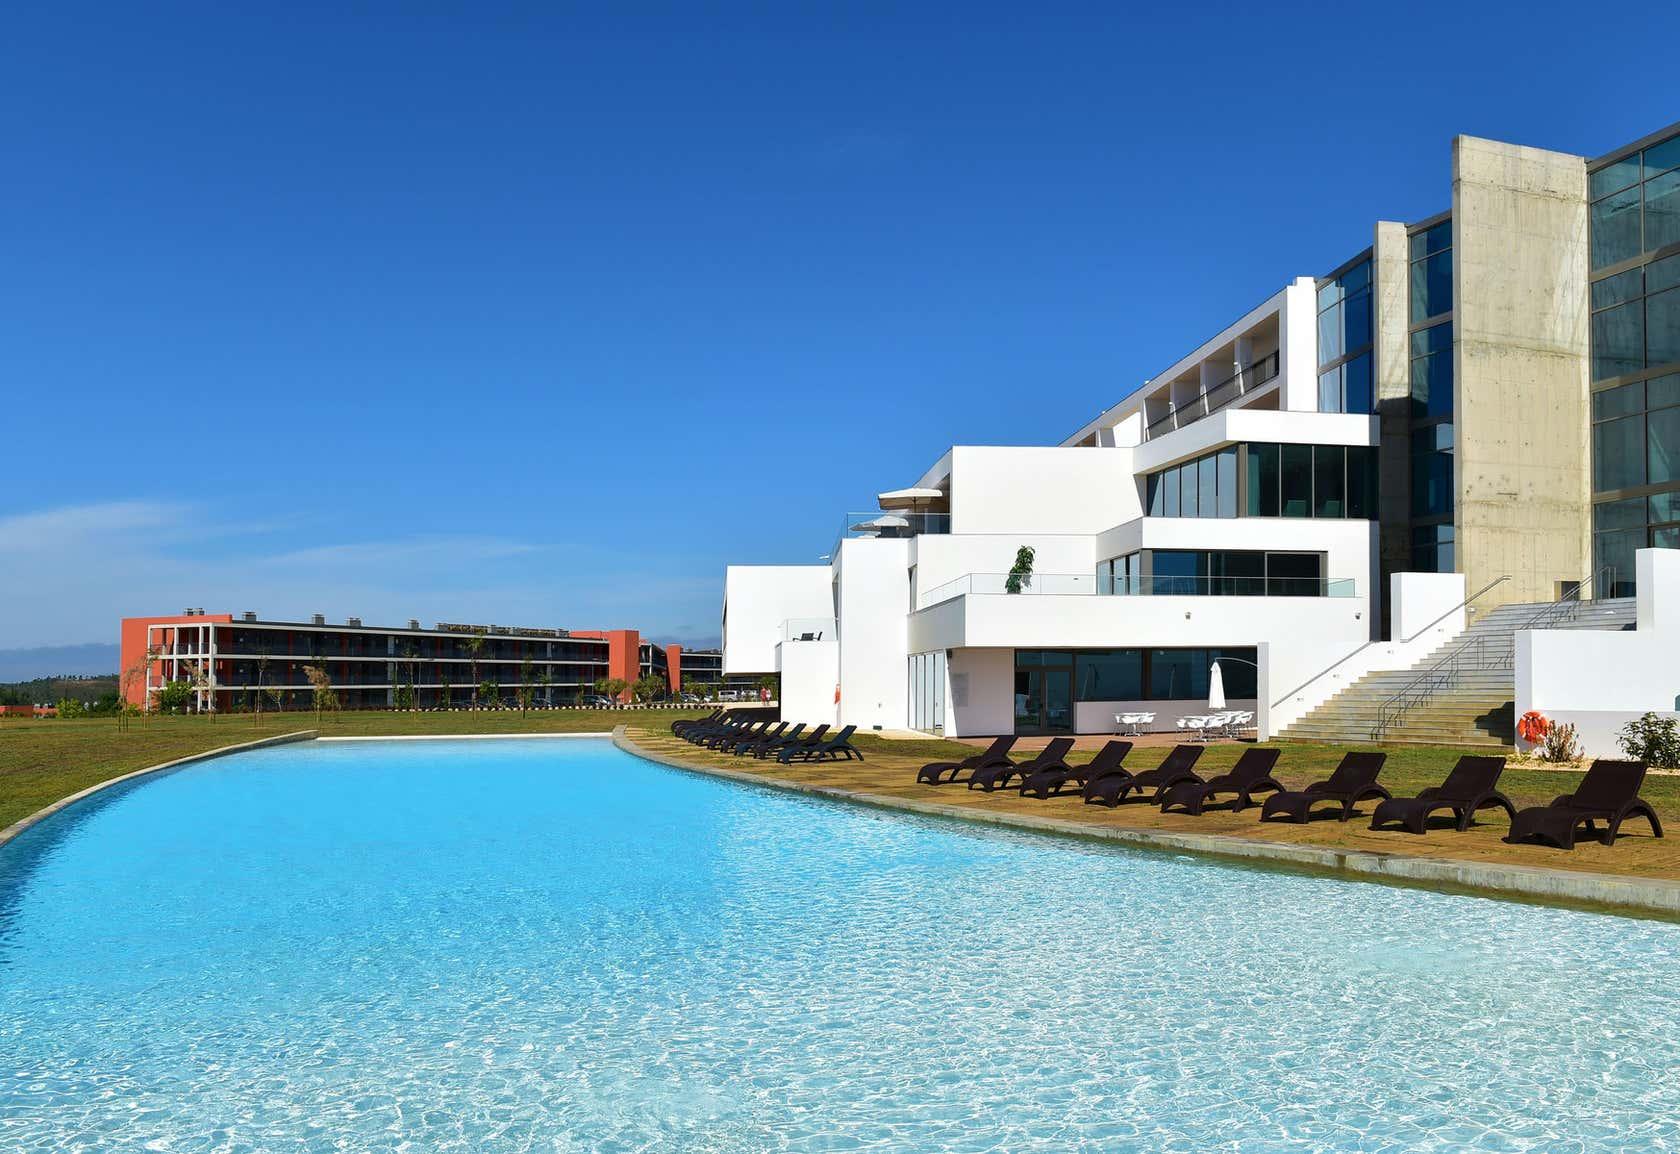 Pestana Algarve Race Hotel